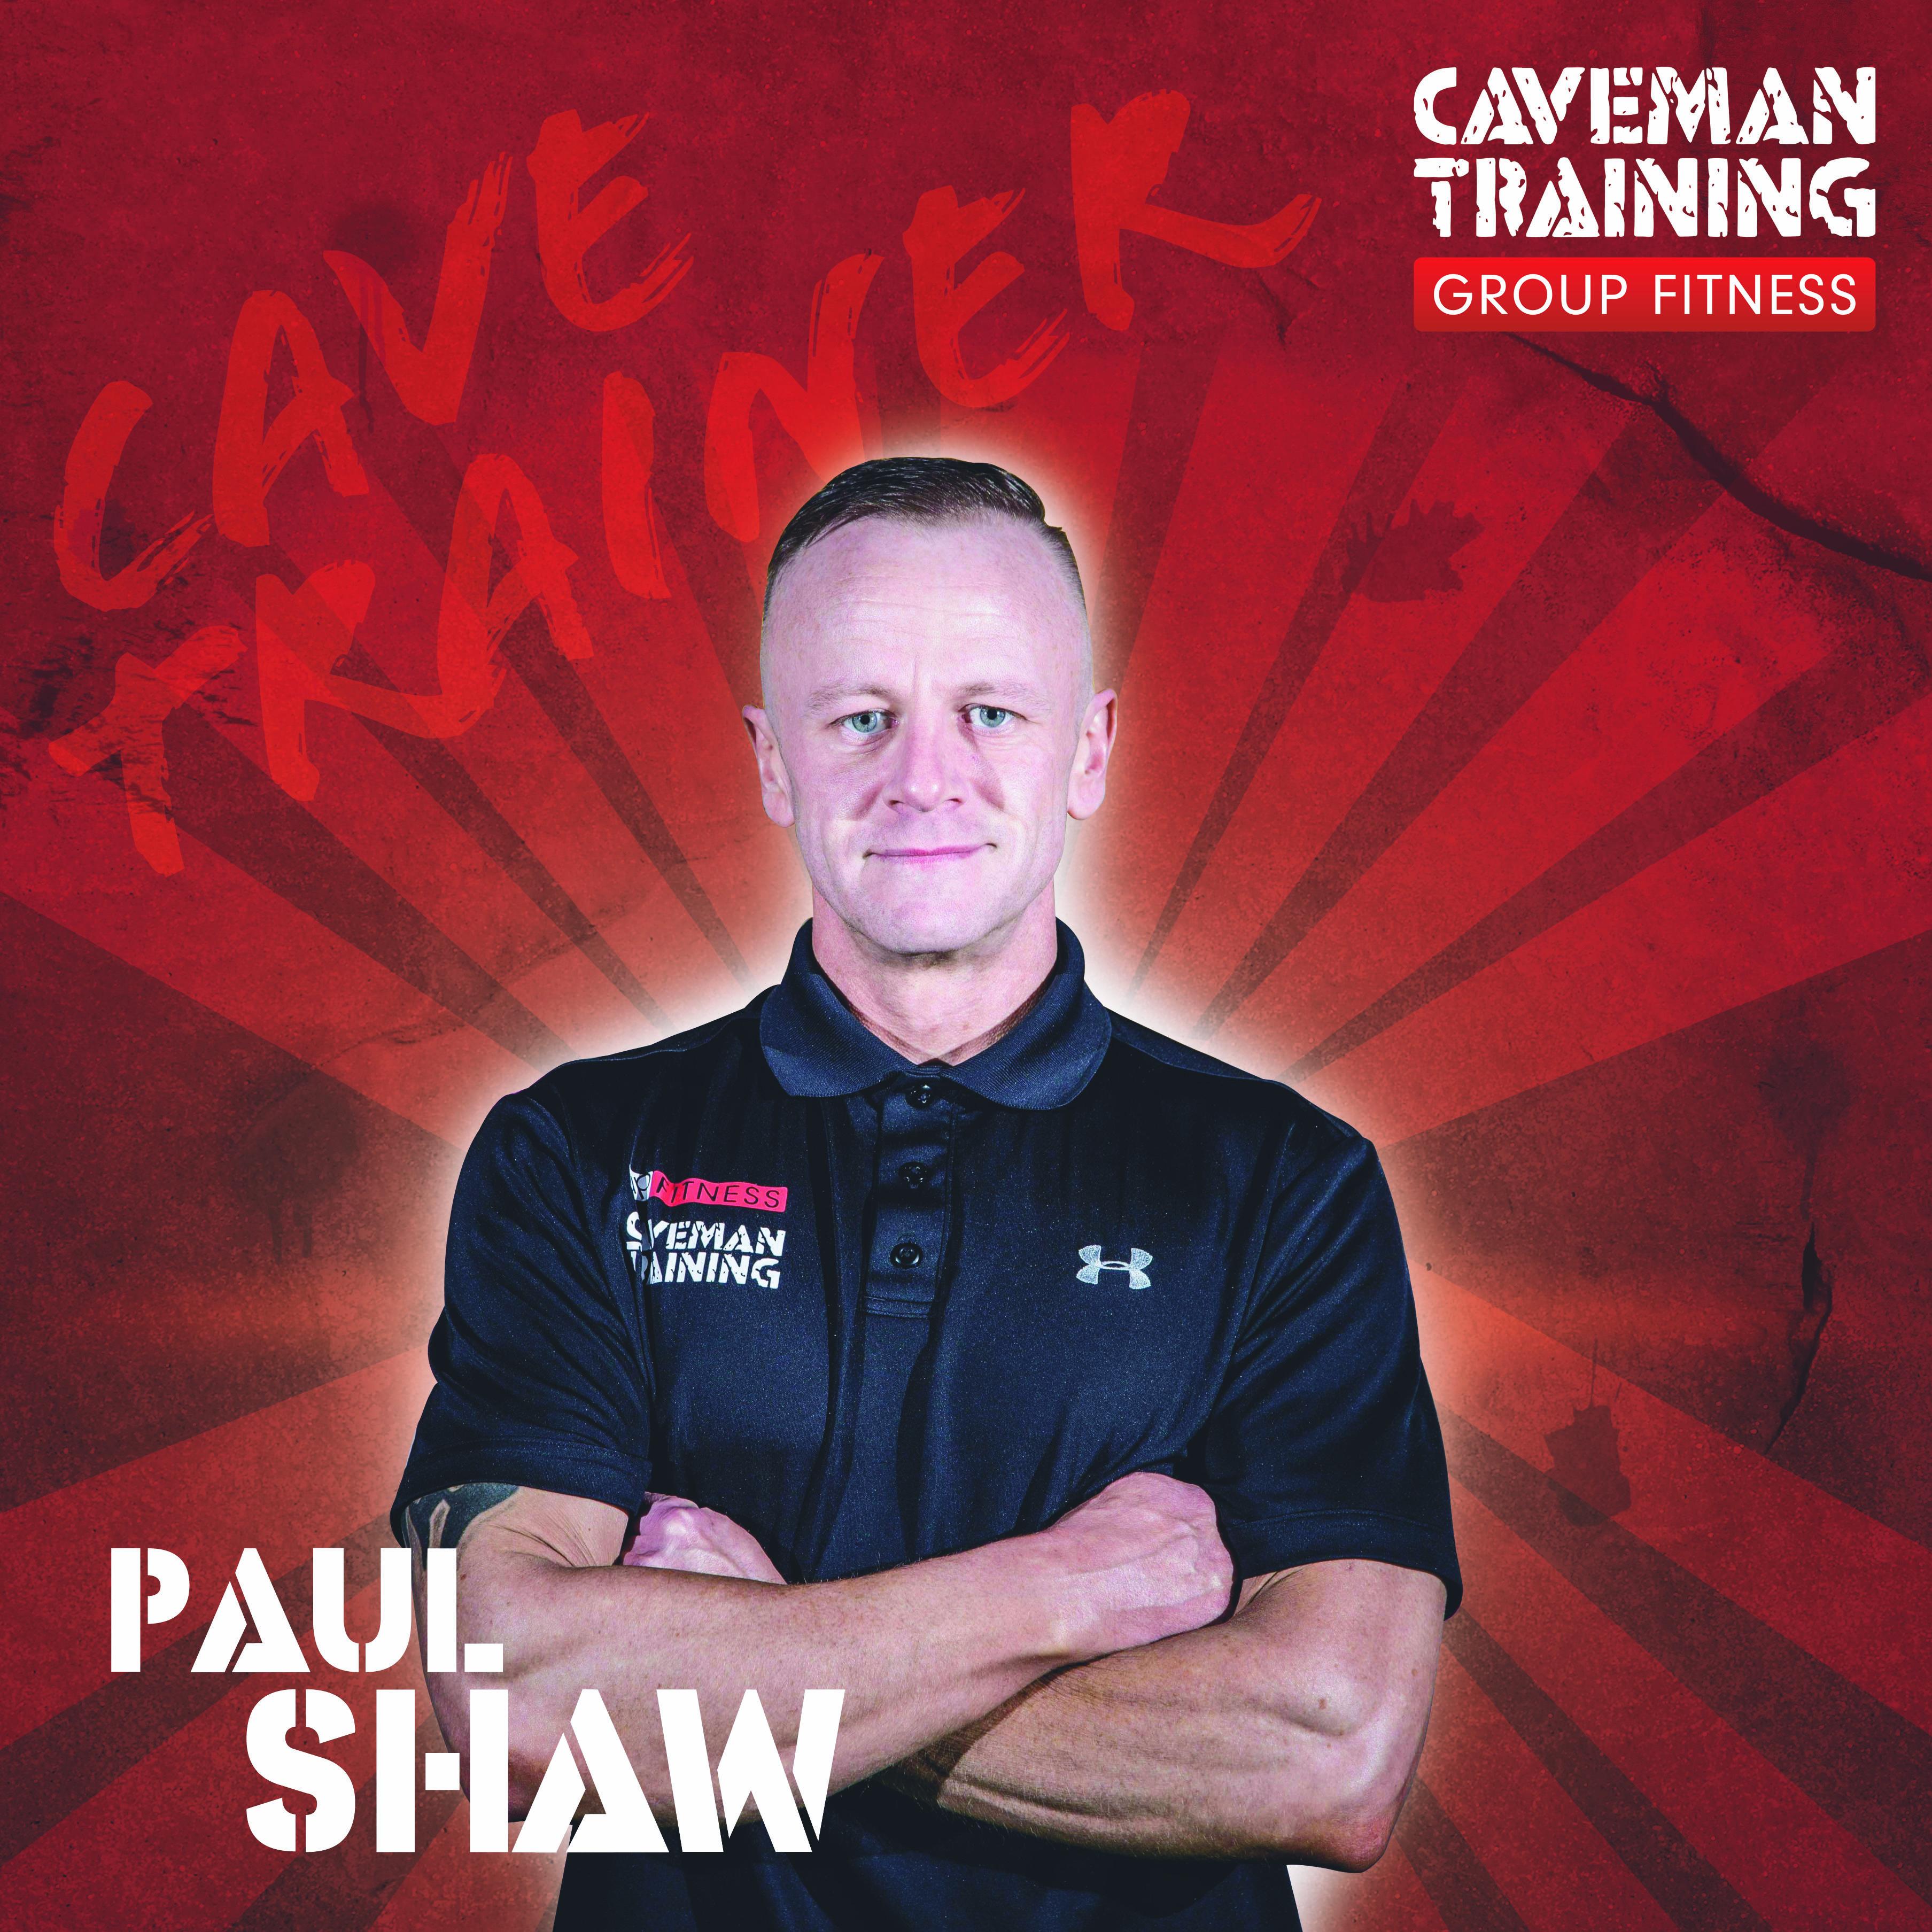 Caveman Training Trainer - Paul Shaw